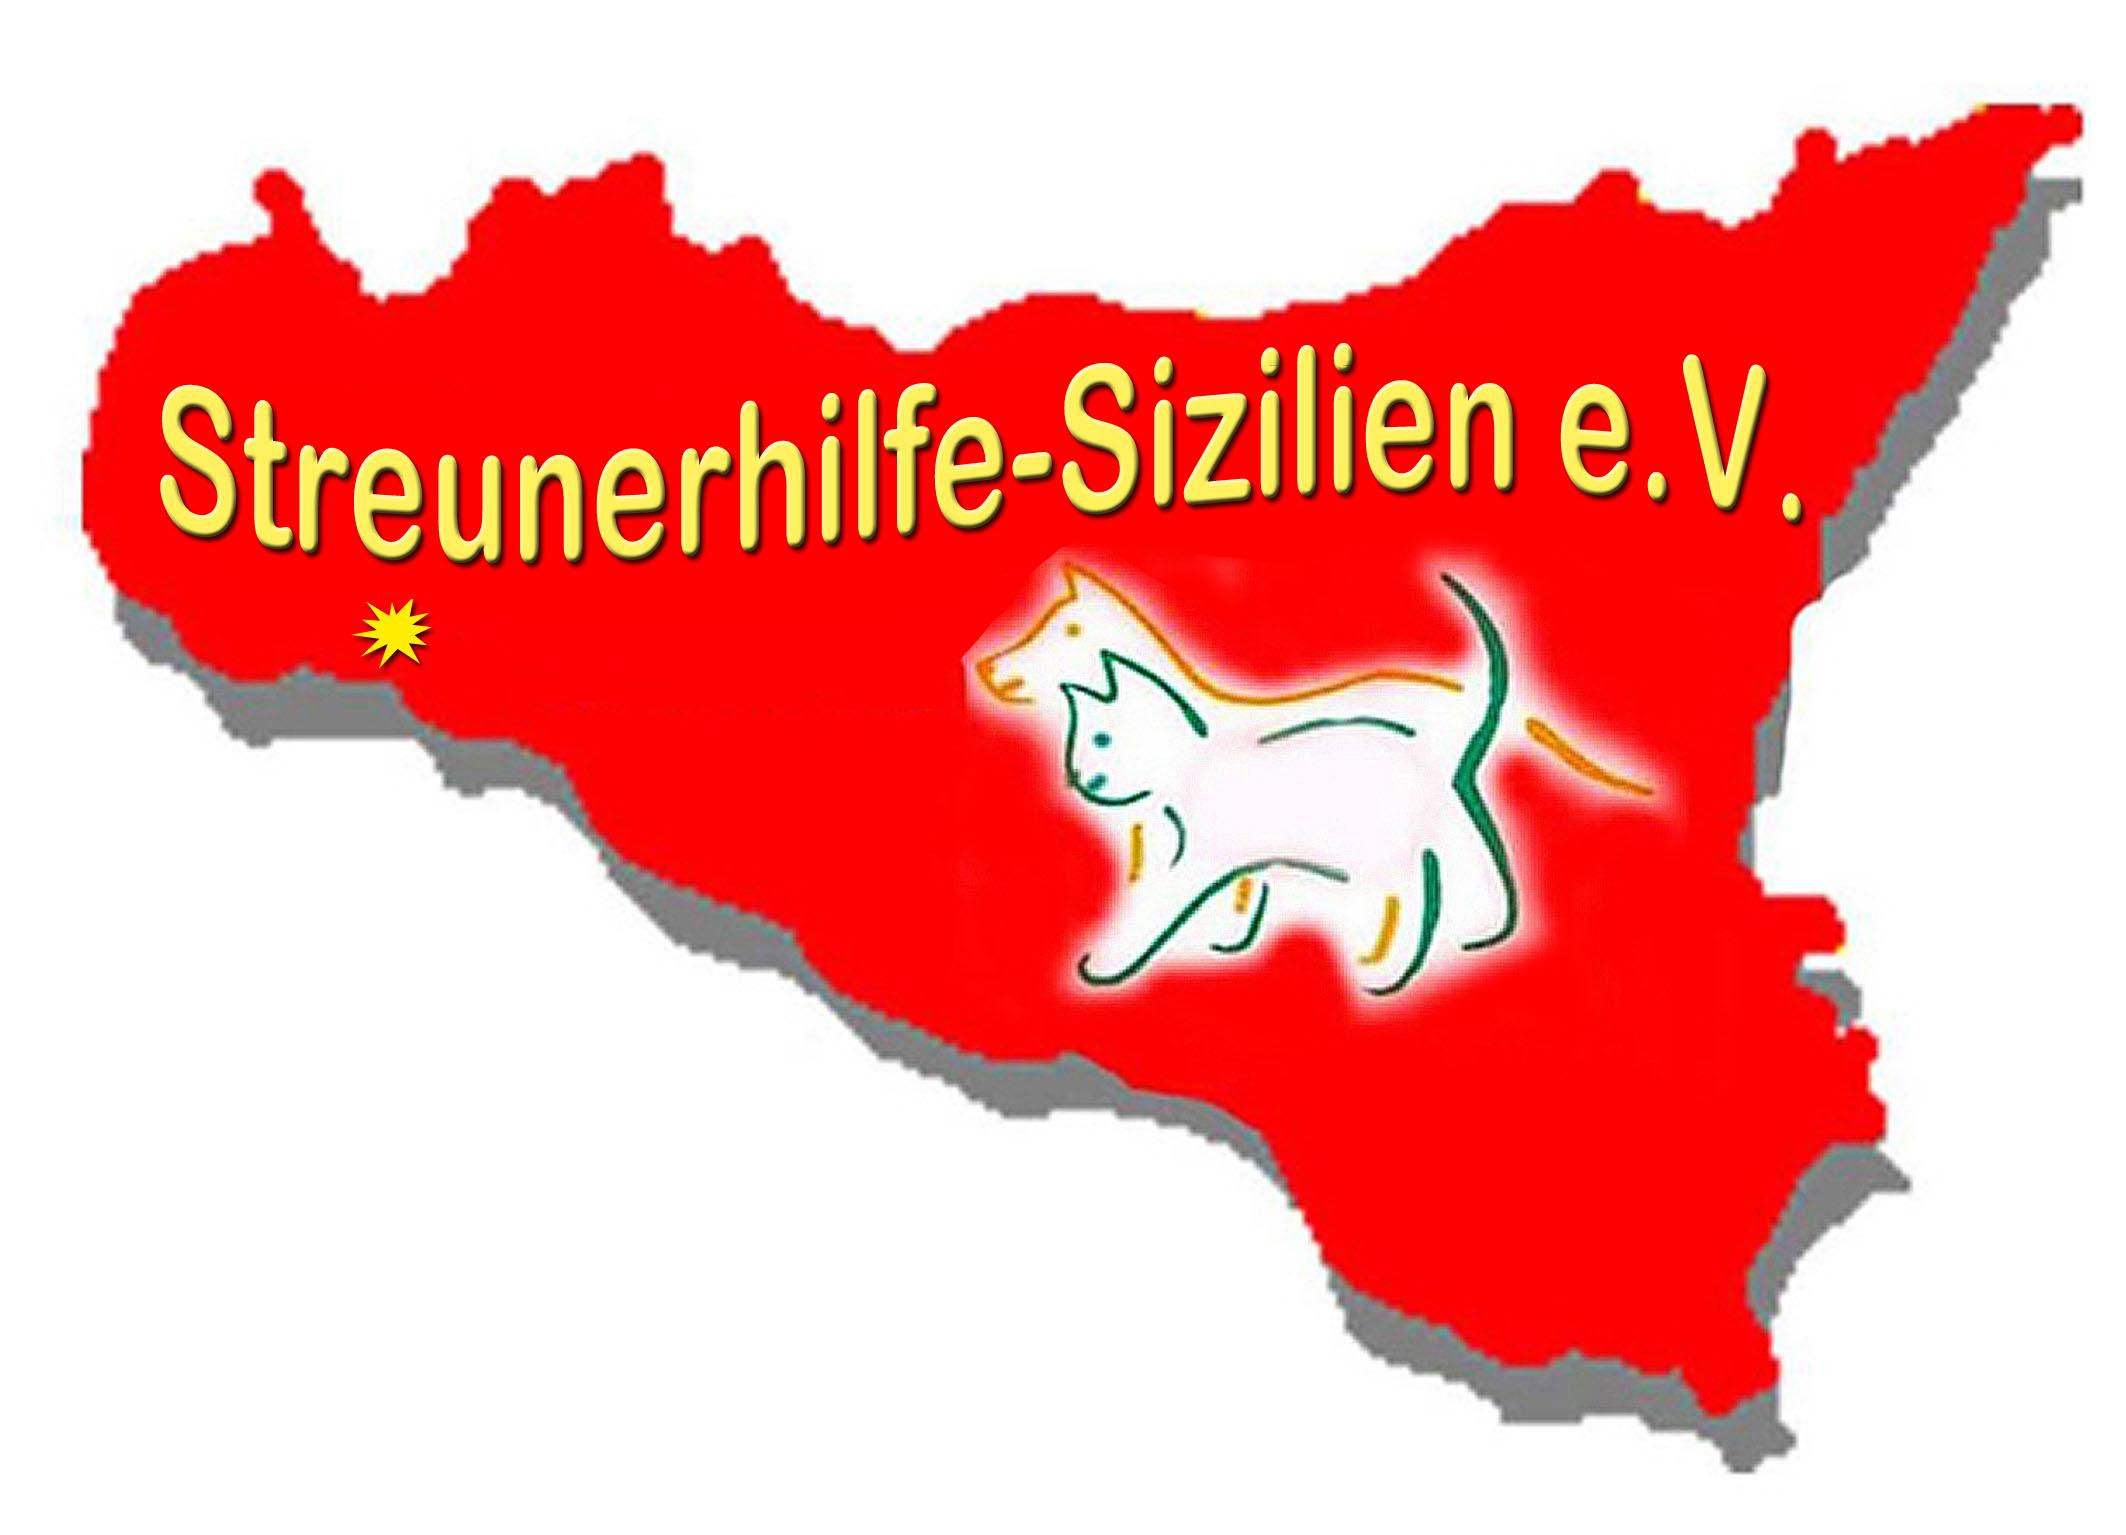 Streunerhilfe Sizilien e.V. – Wir stellen uns vor